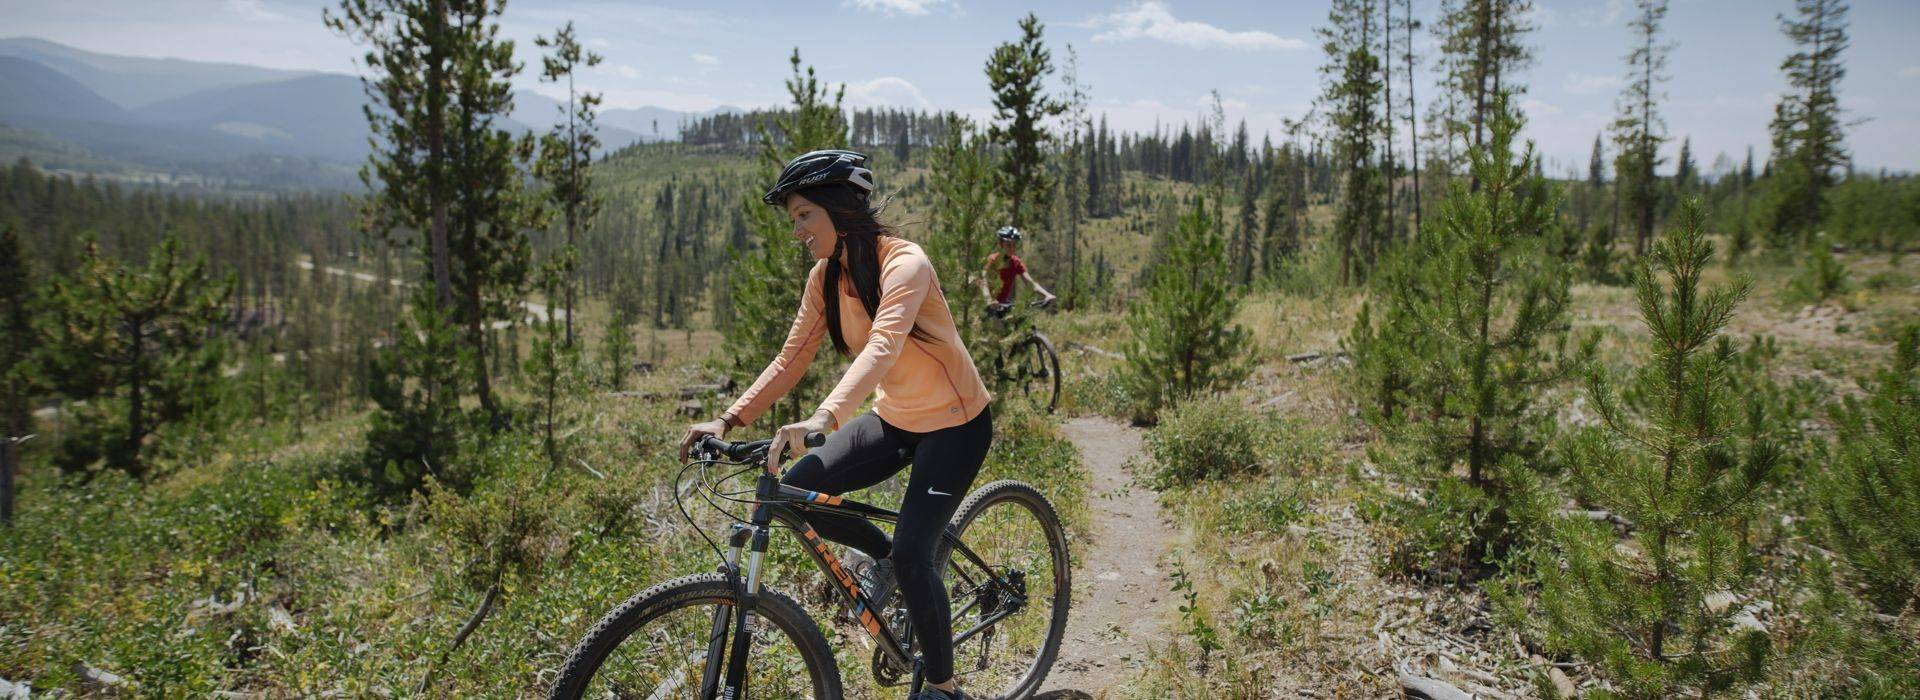 Biking Vacations